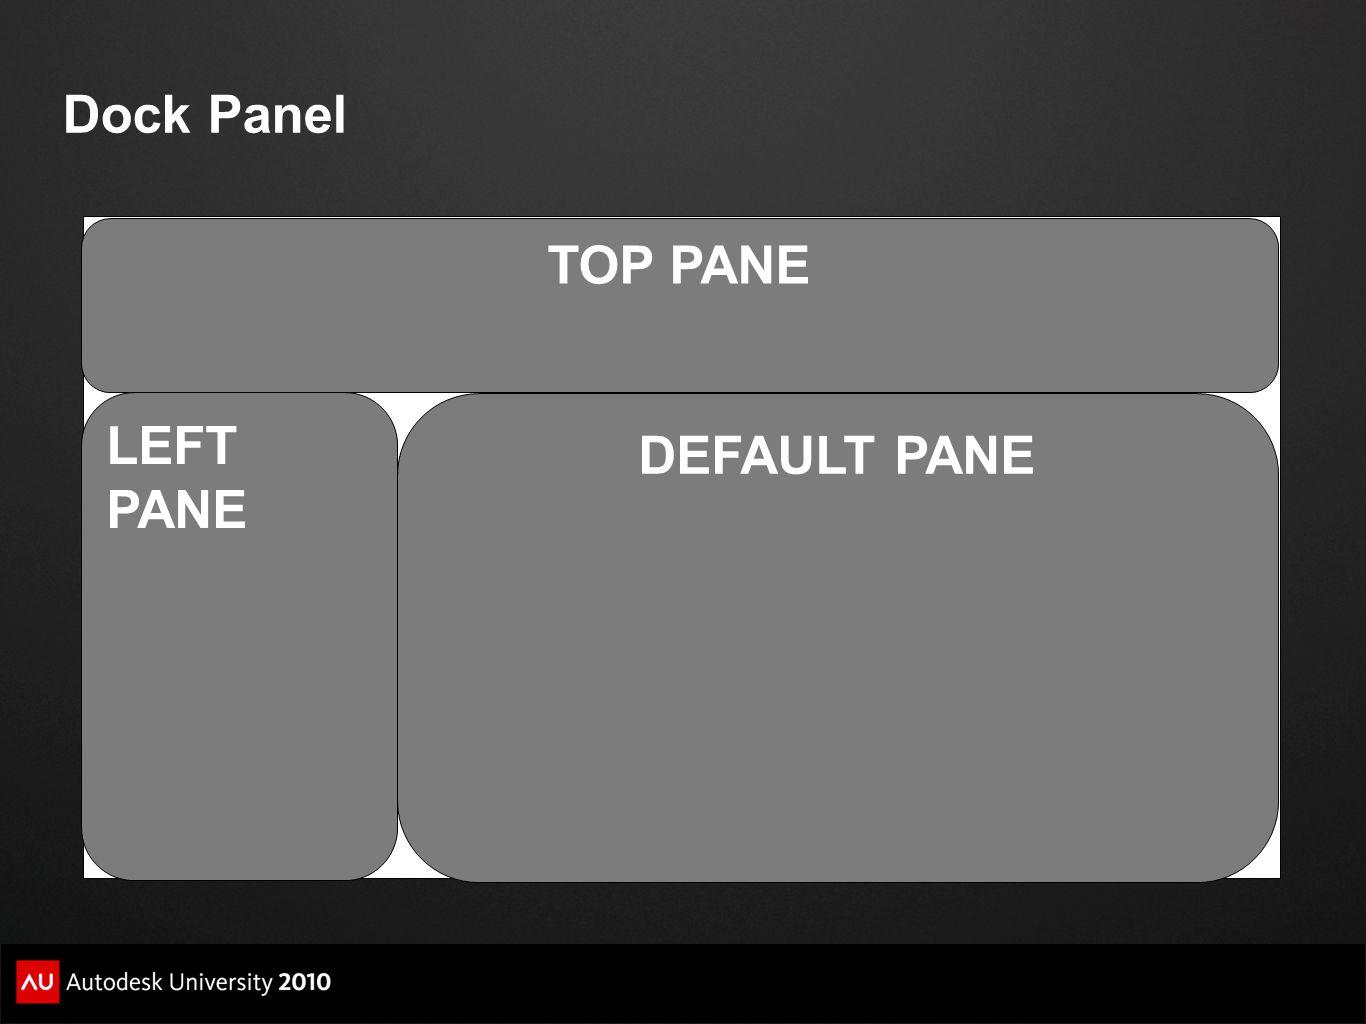 Dock Panel TOP PANE LEFT PANE DEFAULT PANE